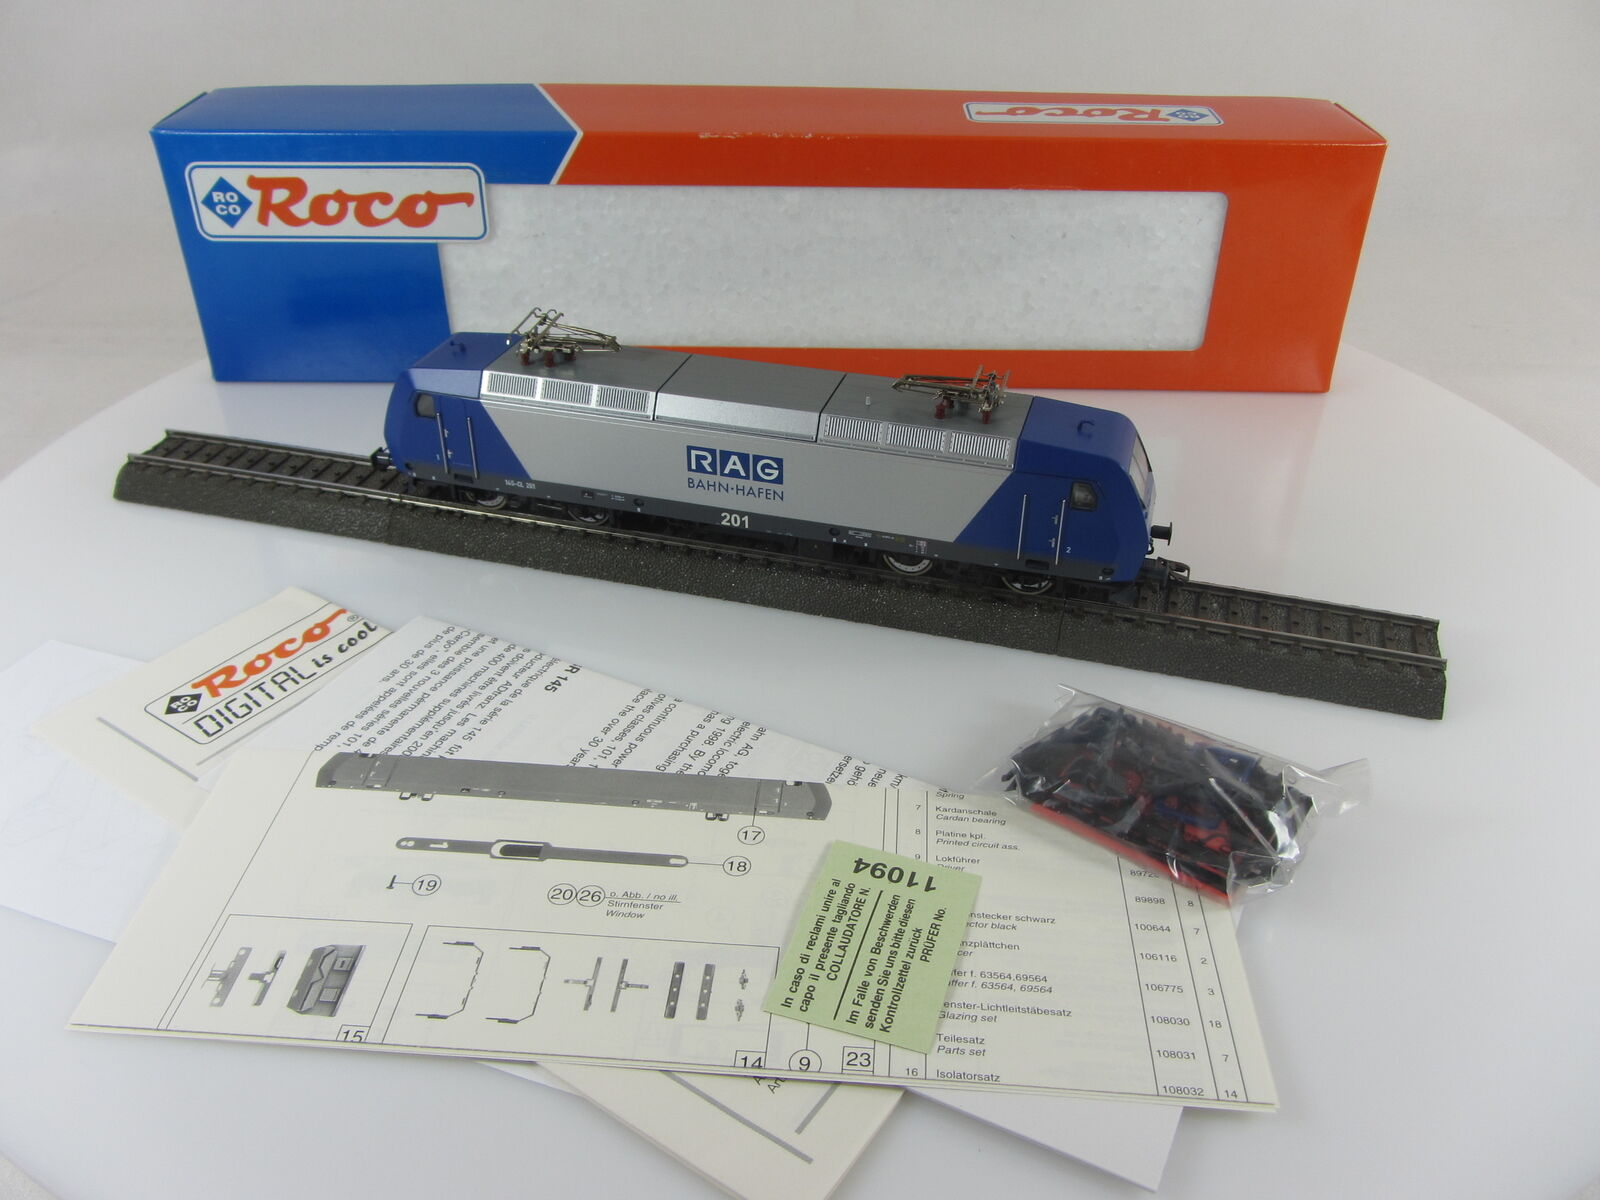 ROCO 69565 elektrolokomotive 145-cl201 della Rag ferrovia Porto Digital e con imballo originale